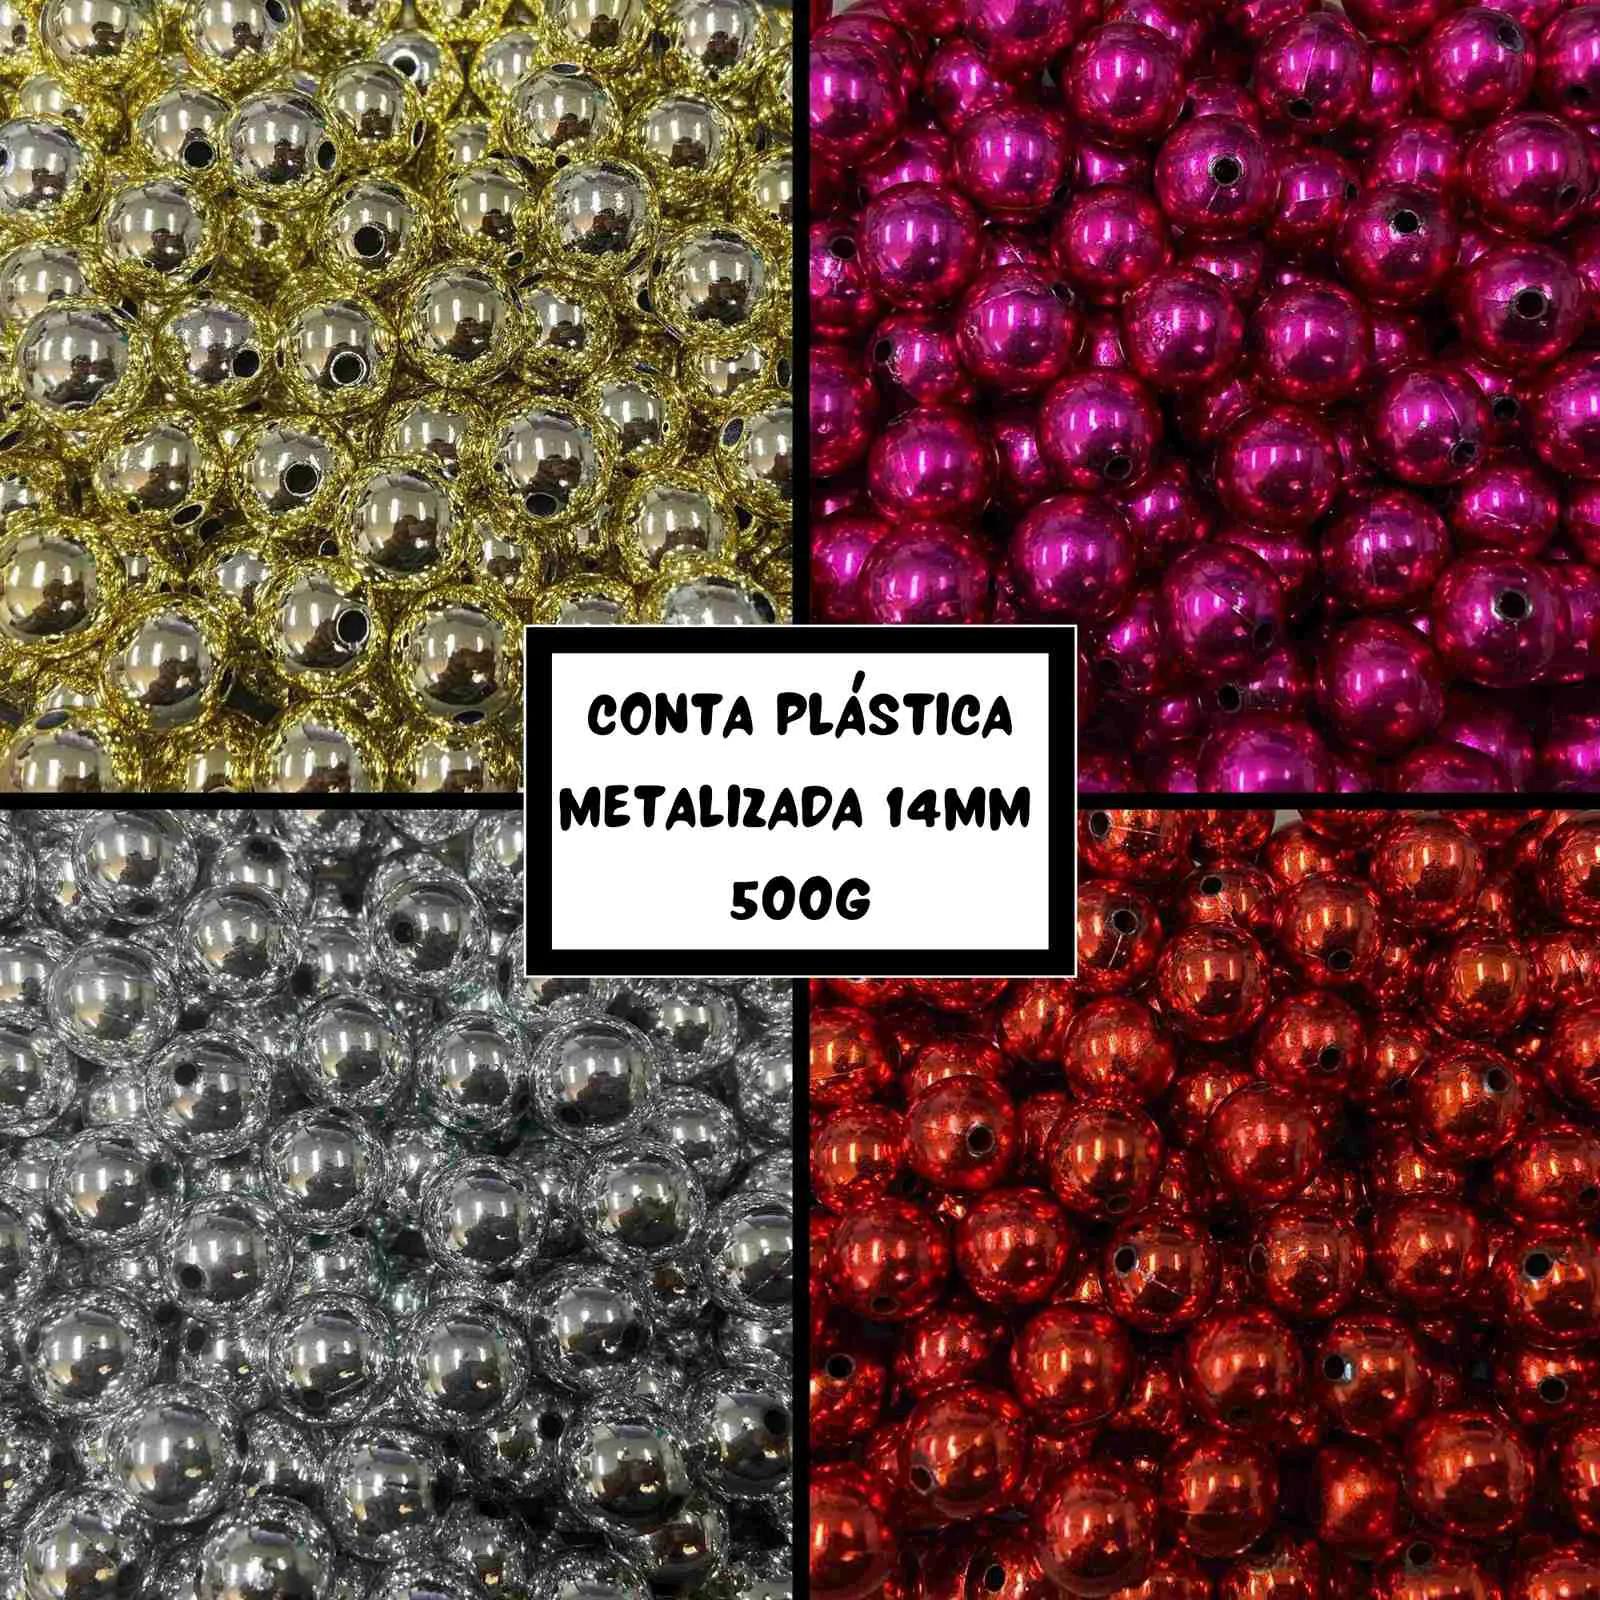 Conta Plástica Metalizada 14mm - 500g